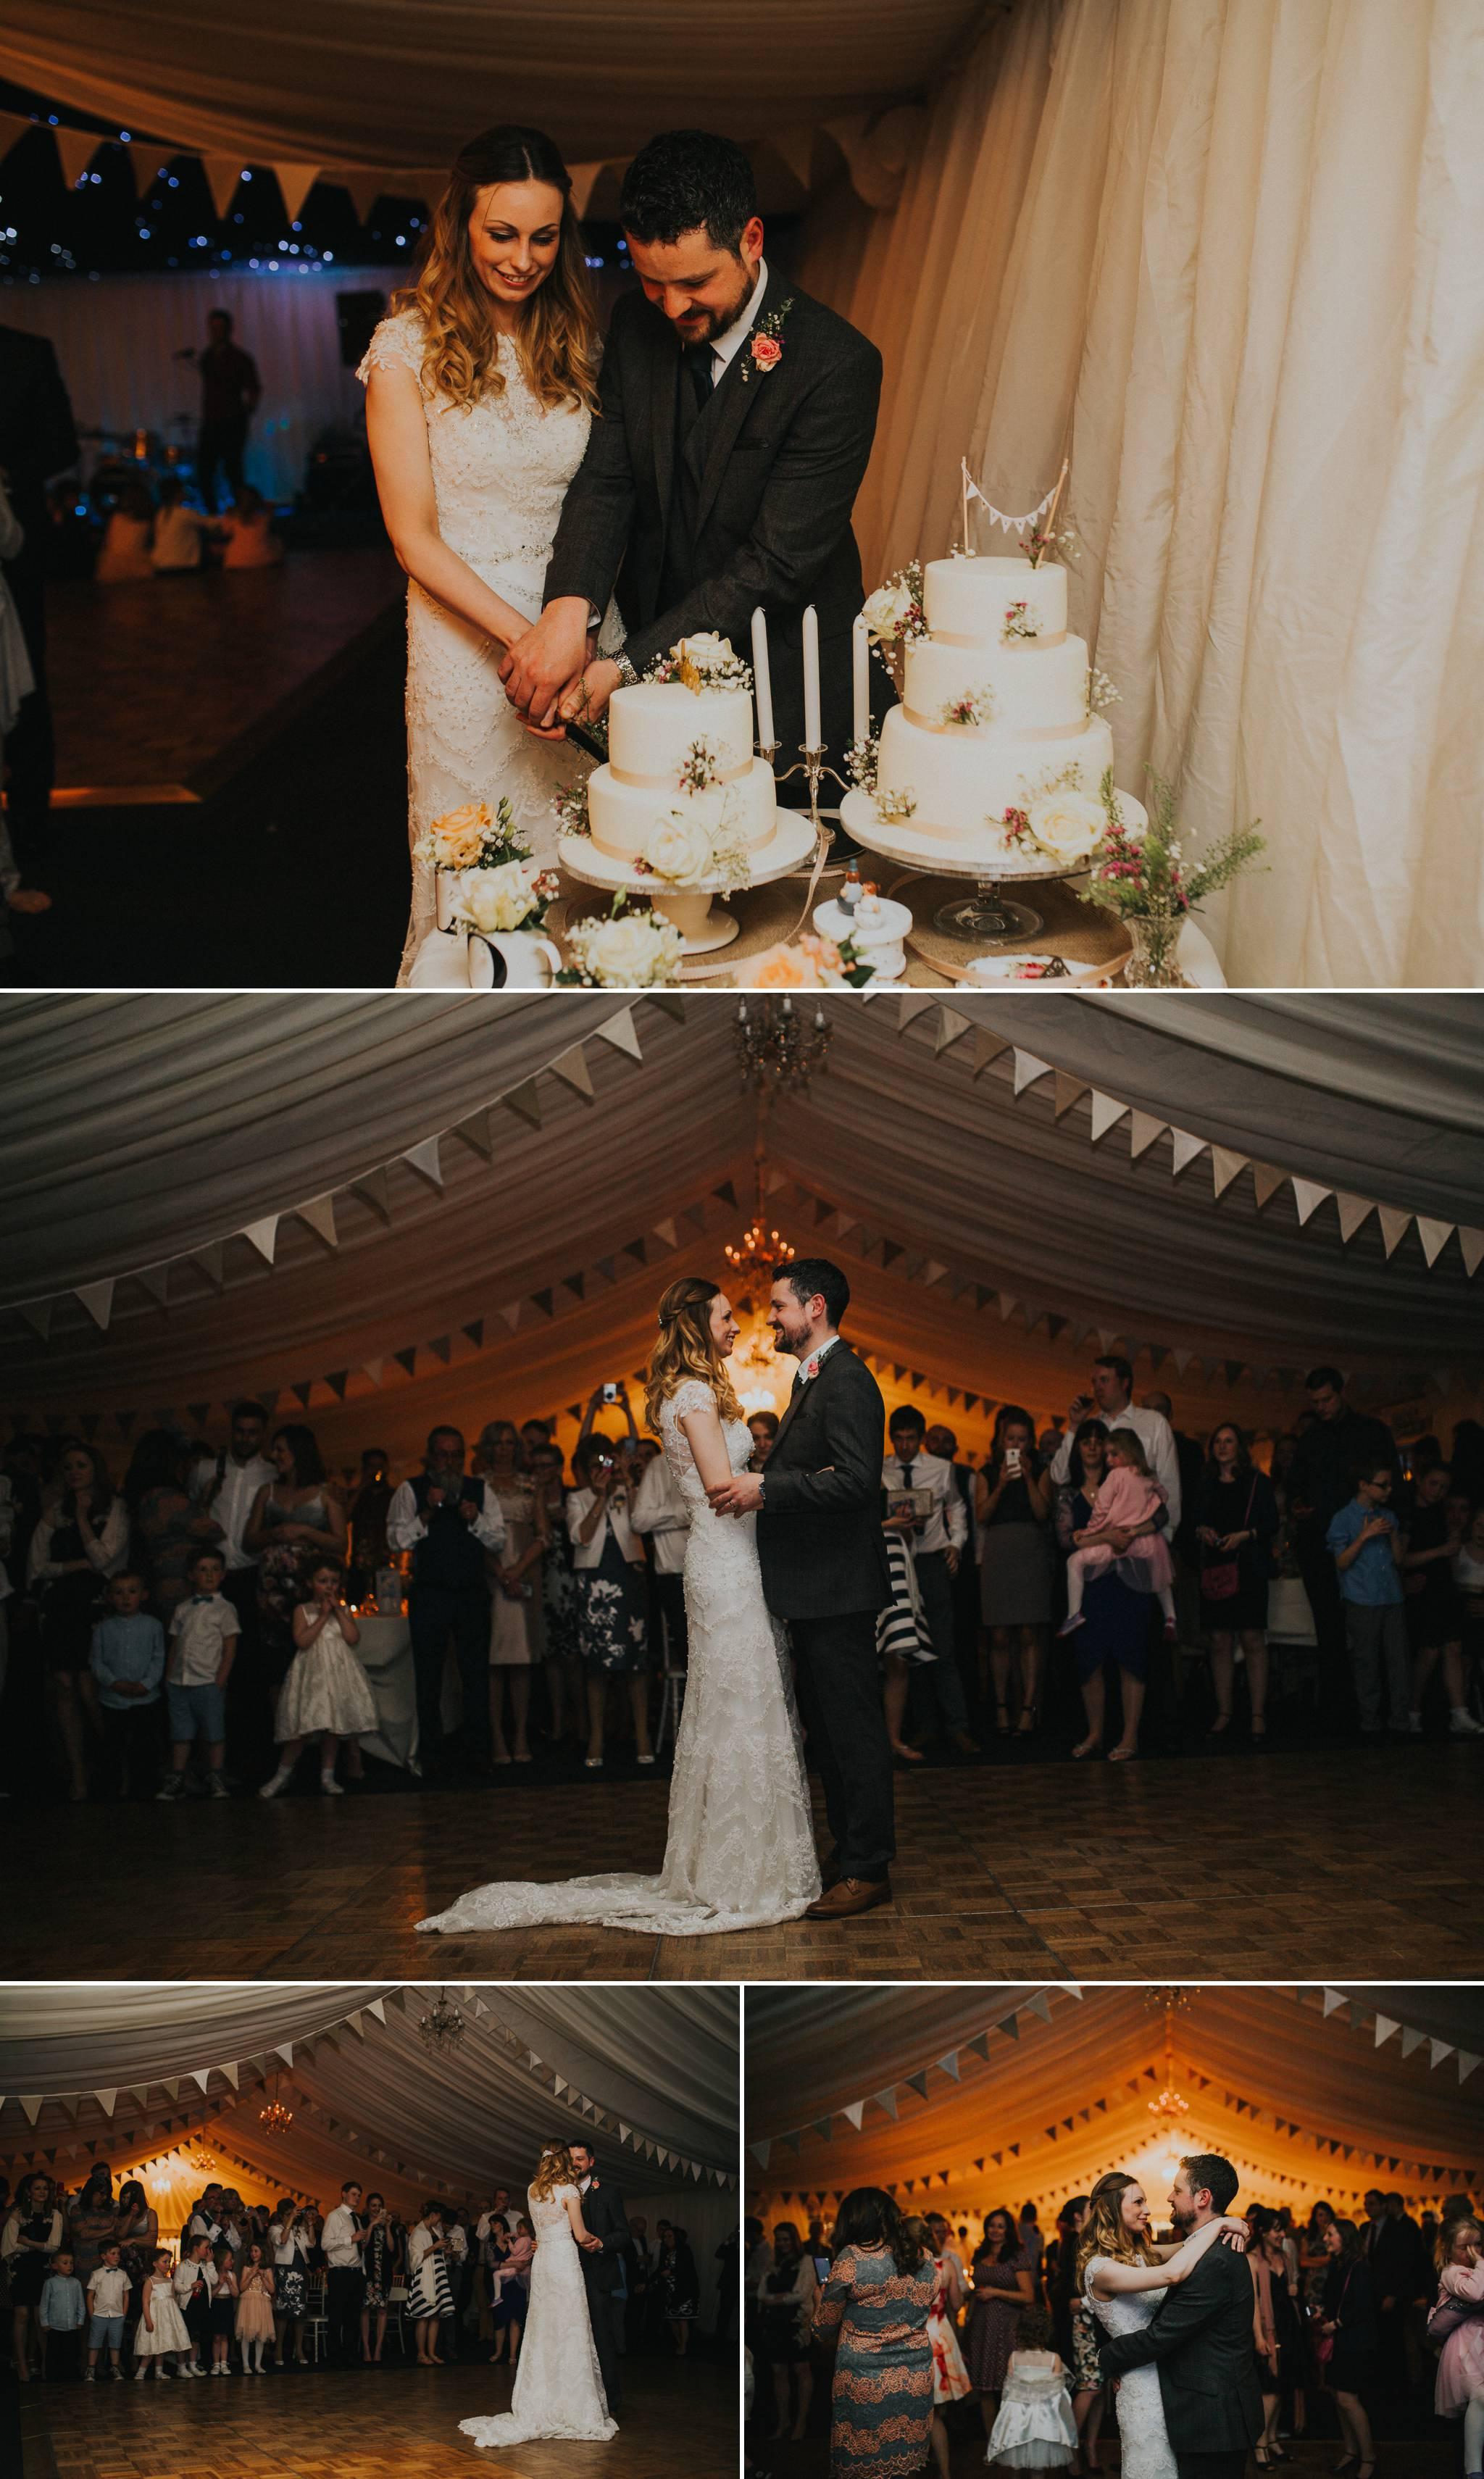 wedding-photographer-staffordshire 23.jpg